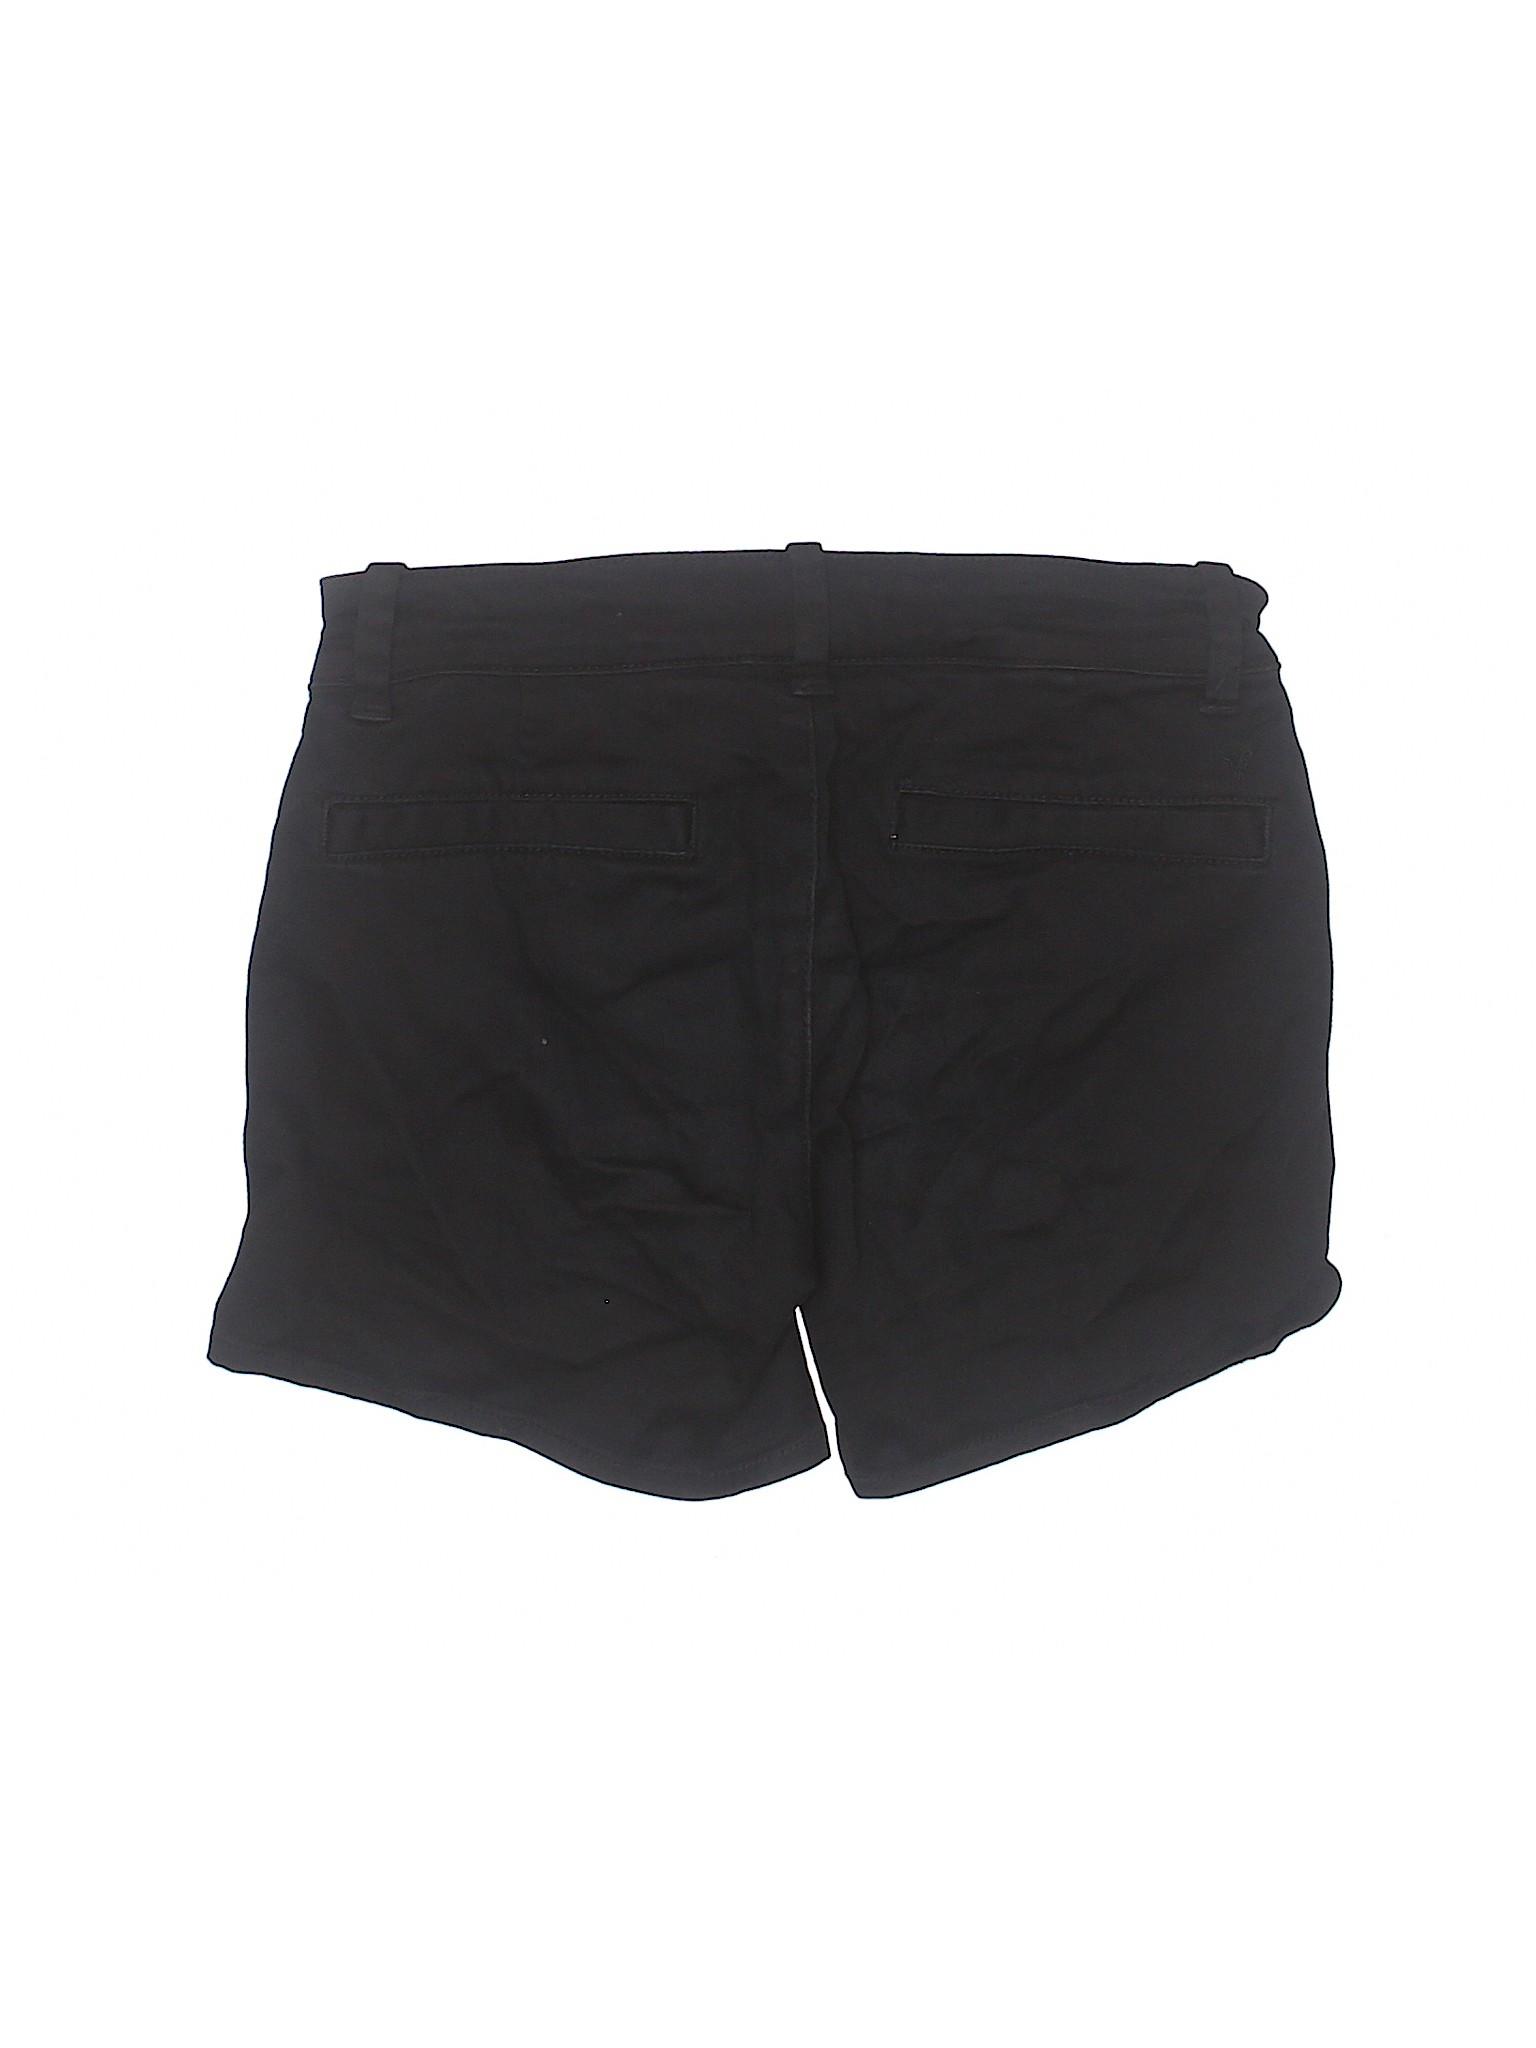 Denim American Eagle Outfitters Shorts Boutique p6dtwqt